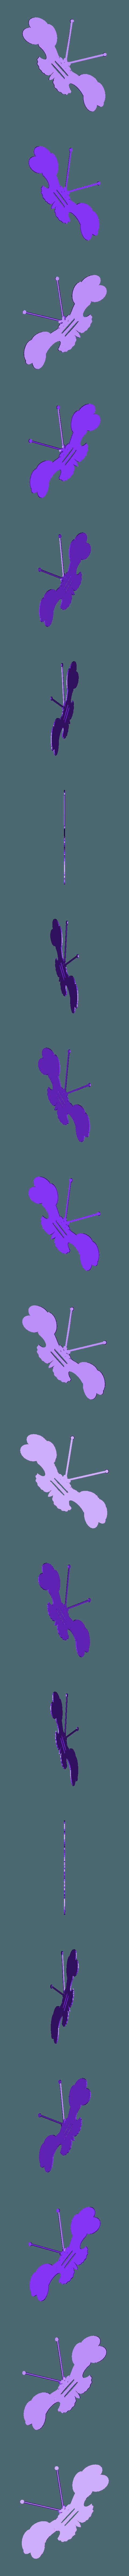 Flappy_Moth_3dprintny.stl Download free STL file Butterfly Fun • 3D print template, barb_3dprintny